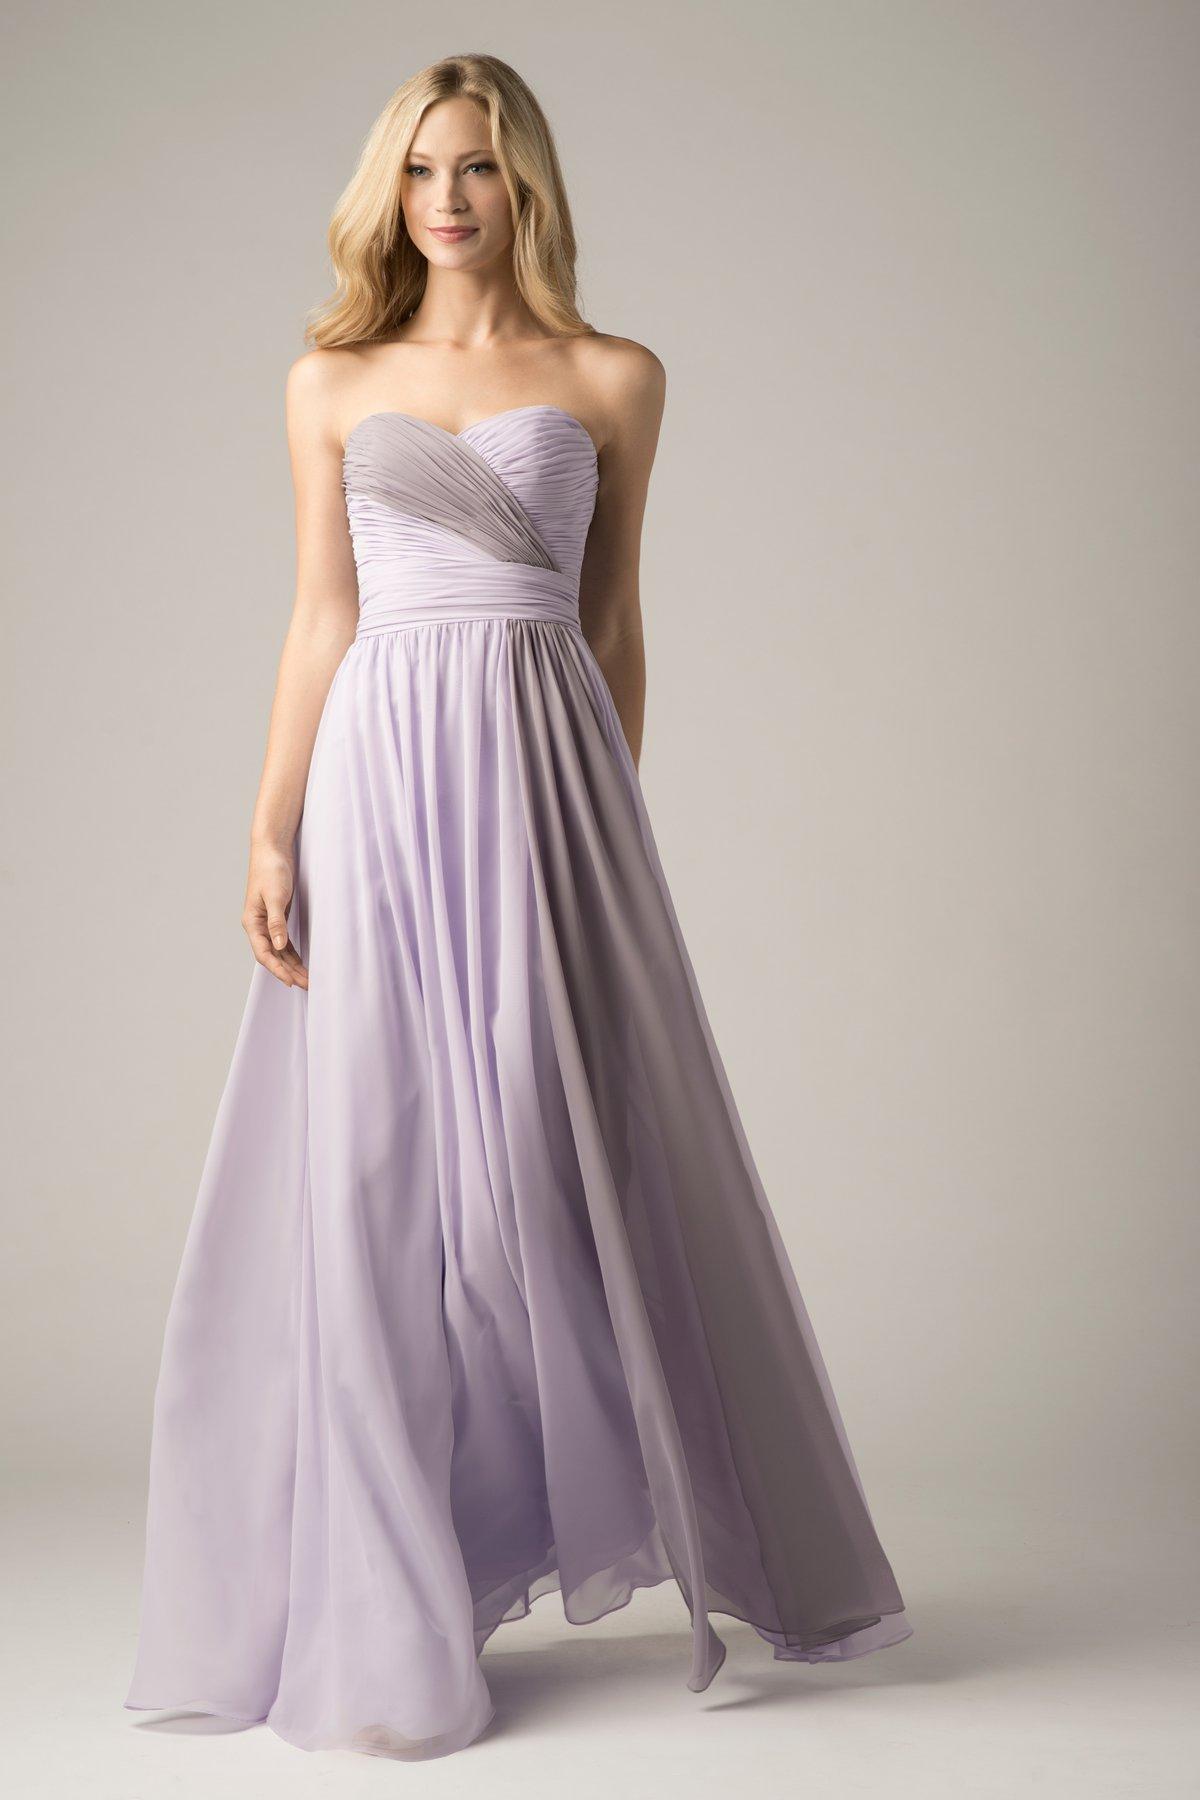 806 | Bridesmaids | Wtoo